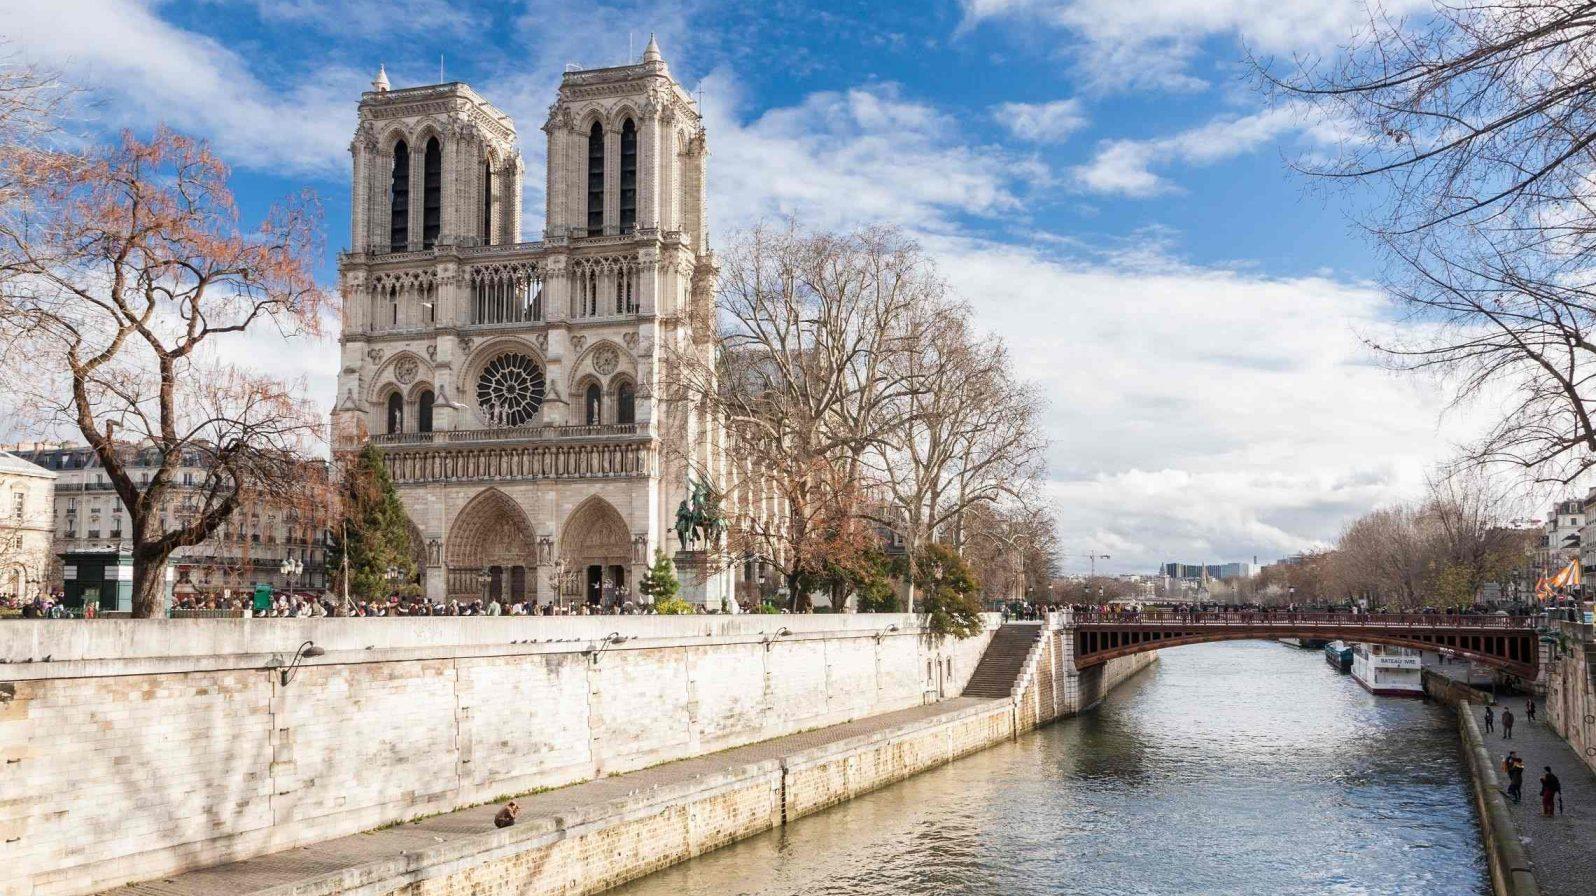 Notre-Damen-Katedraali-Pariisi-1596x896.jpg